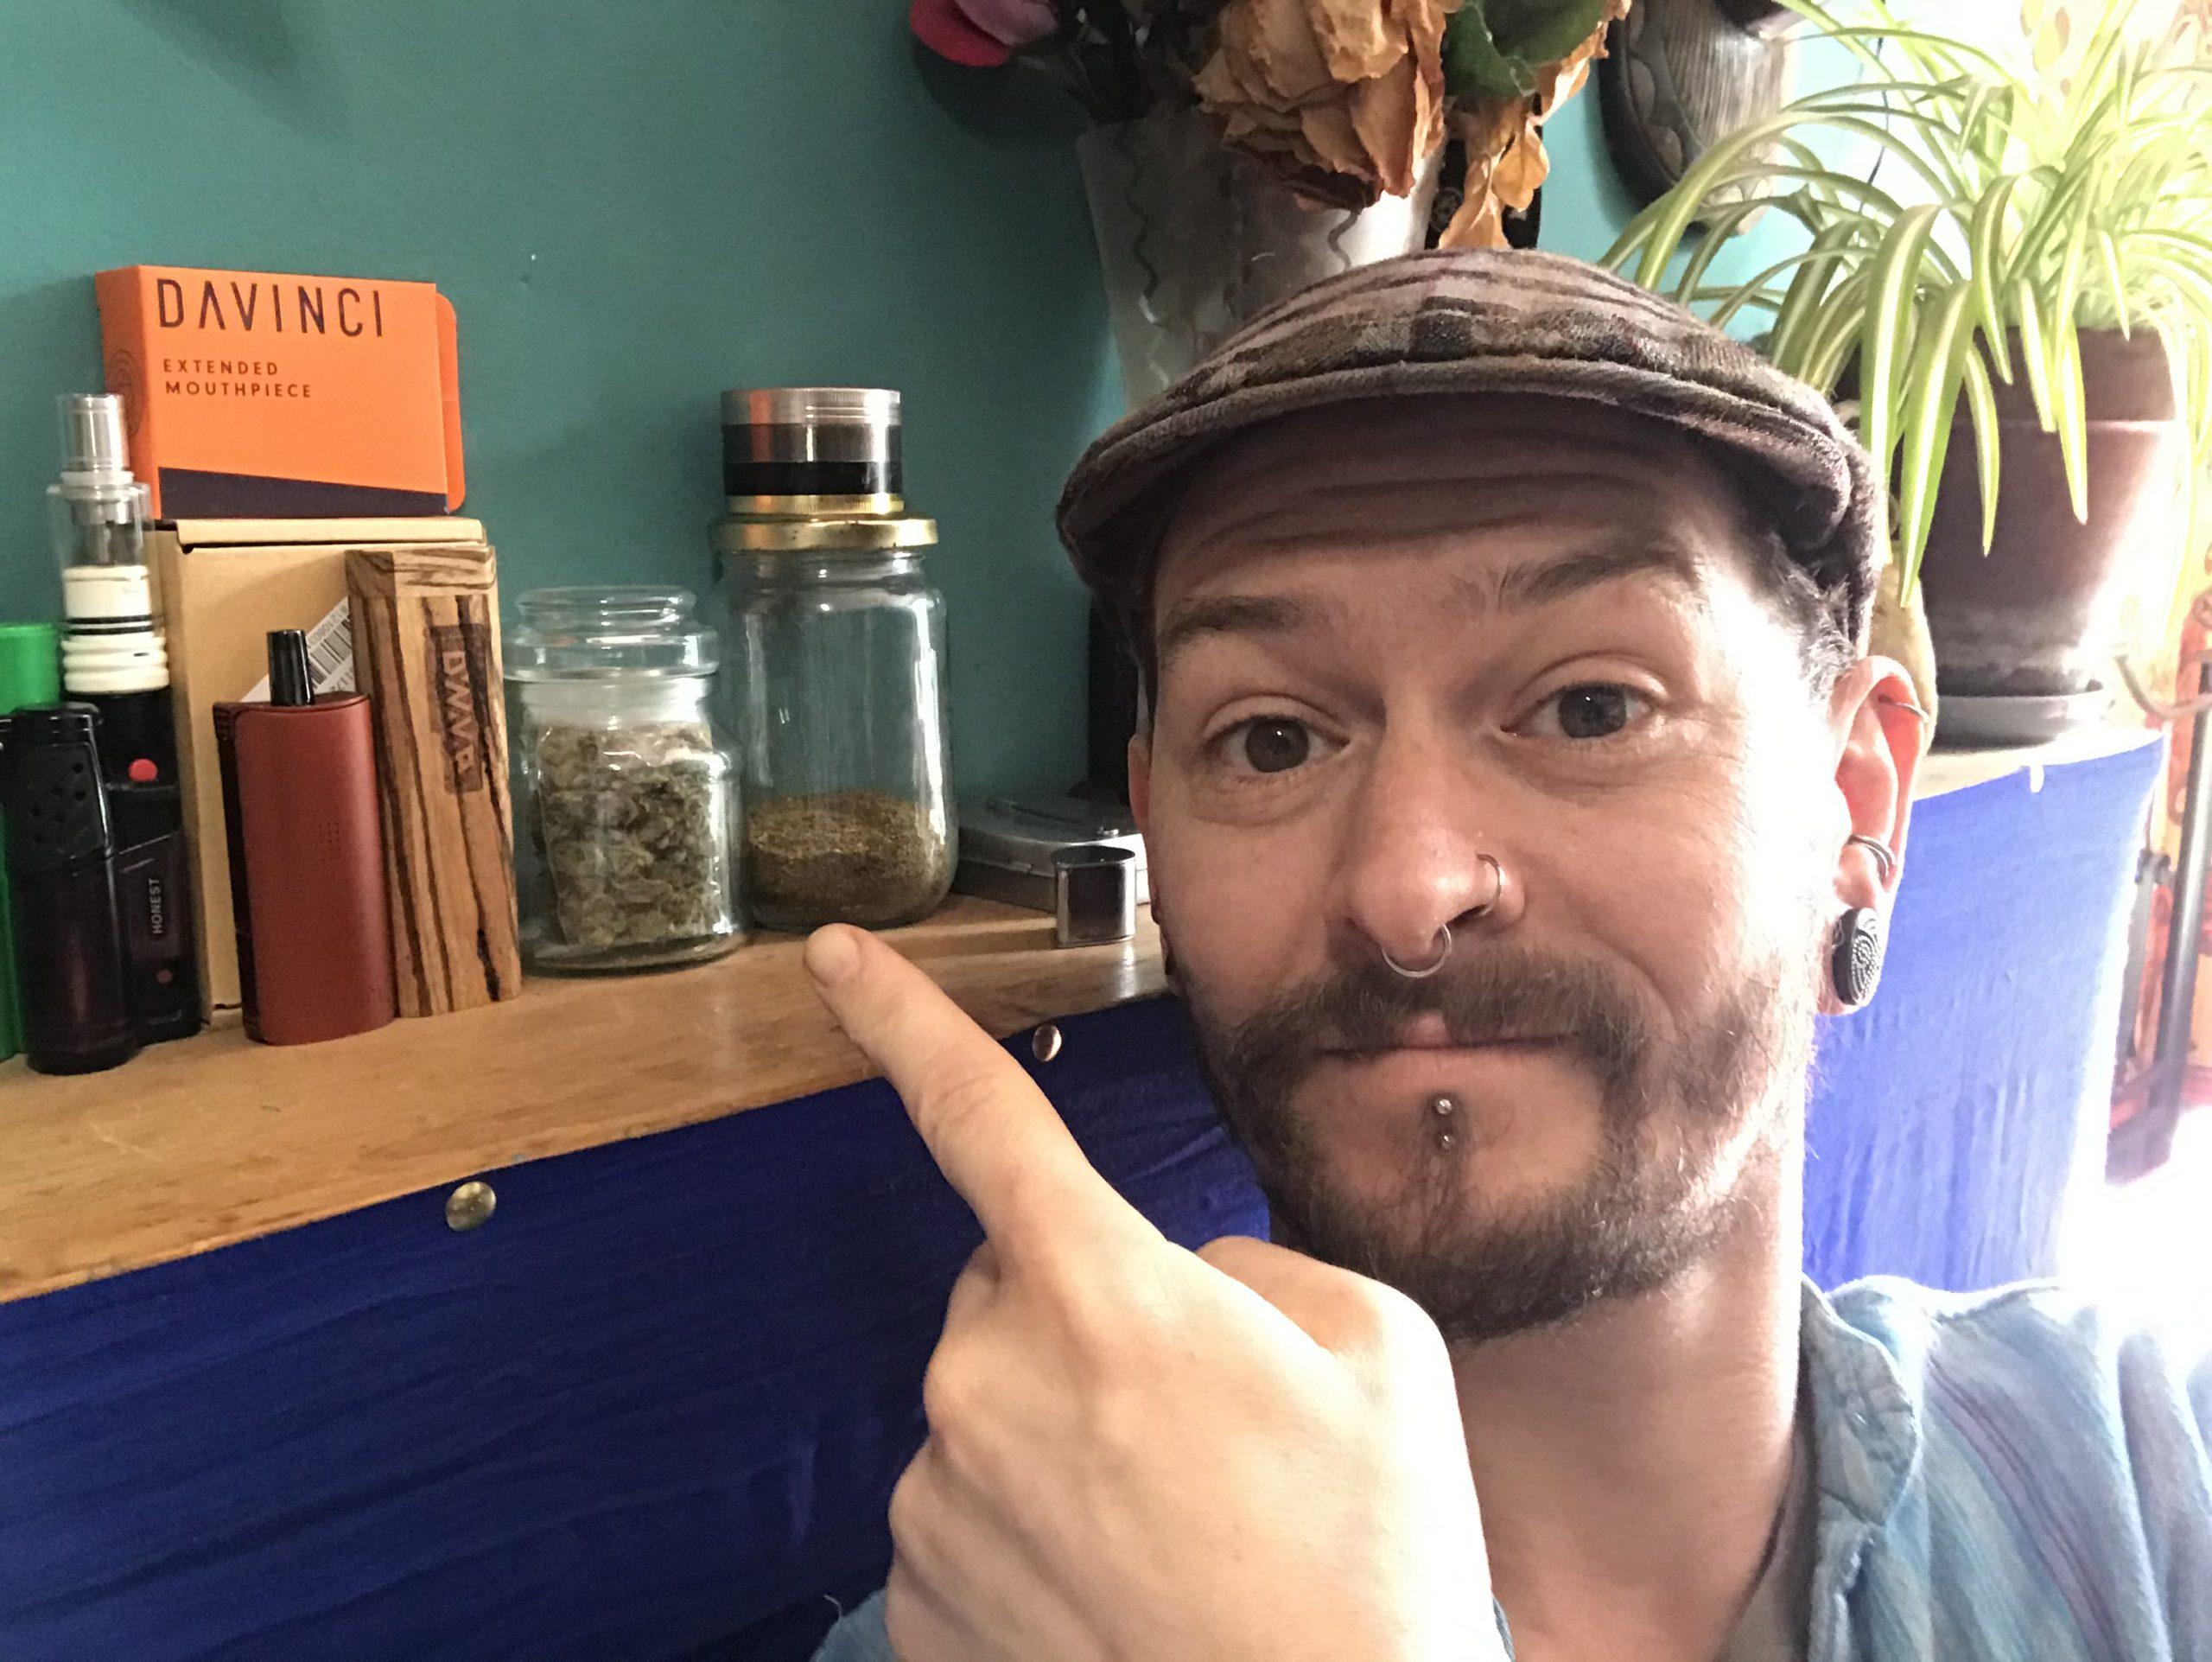 Showing JD proudly displaying his medication